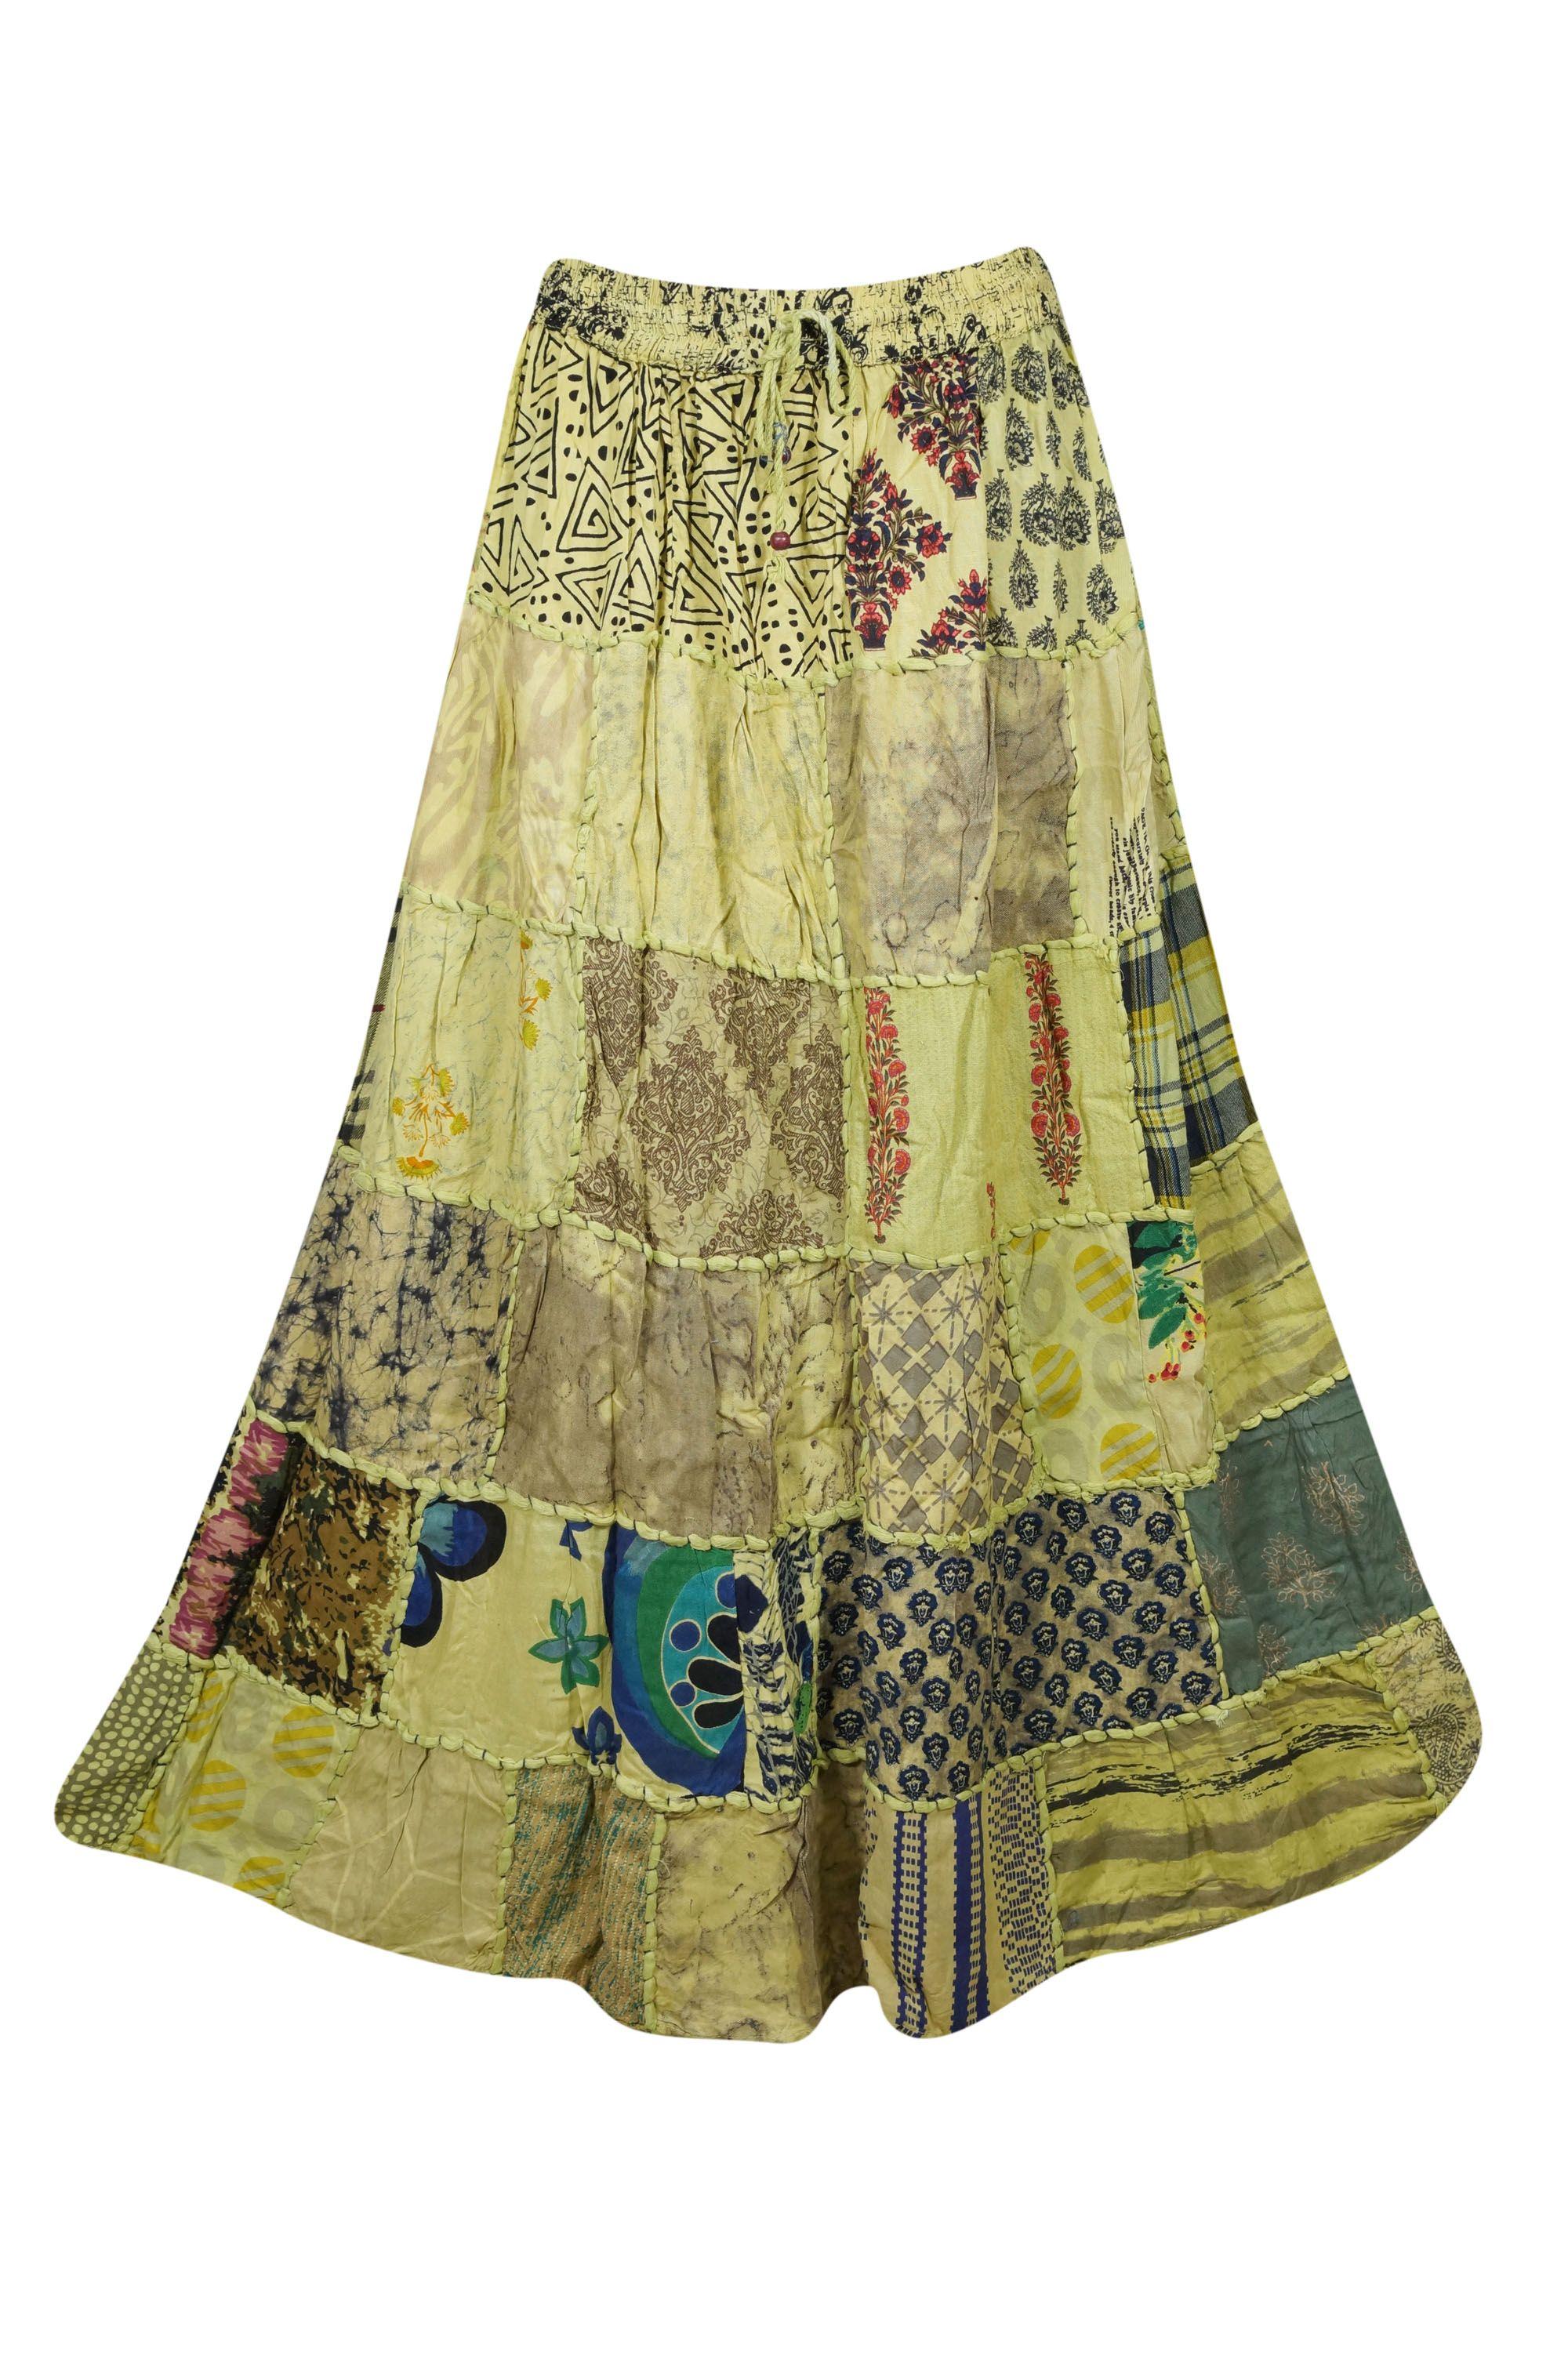 de5cbb8d2 Mogul Women's Vintage Patchwork Long Skirt Rayon Indian Dori Maxi Skirts# Patchwork, #Long